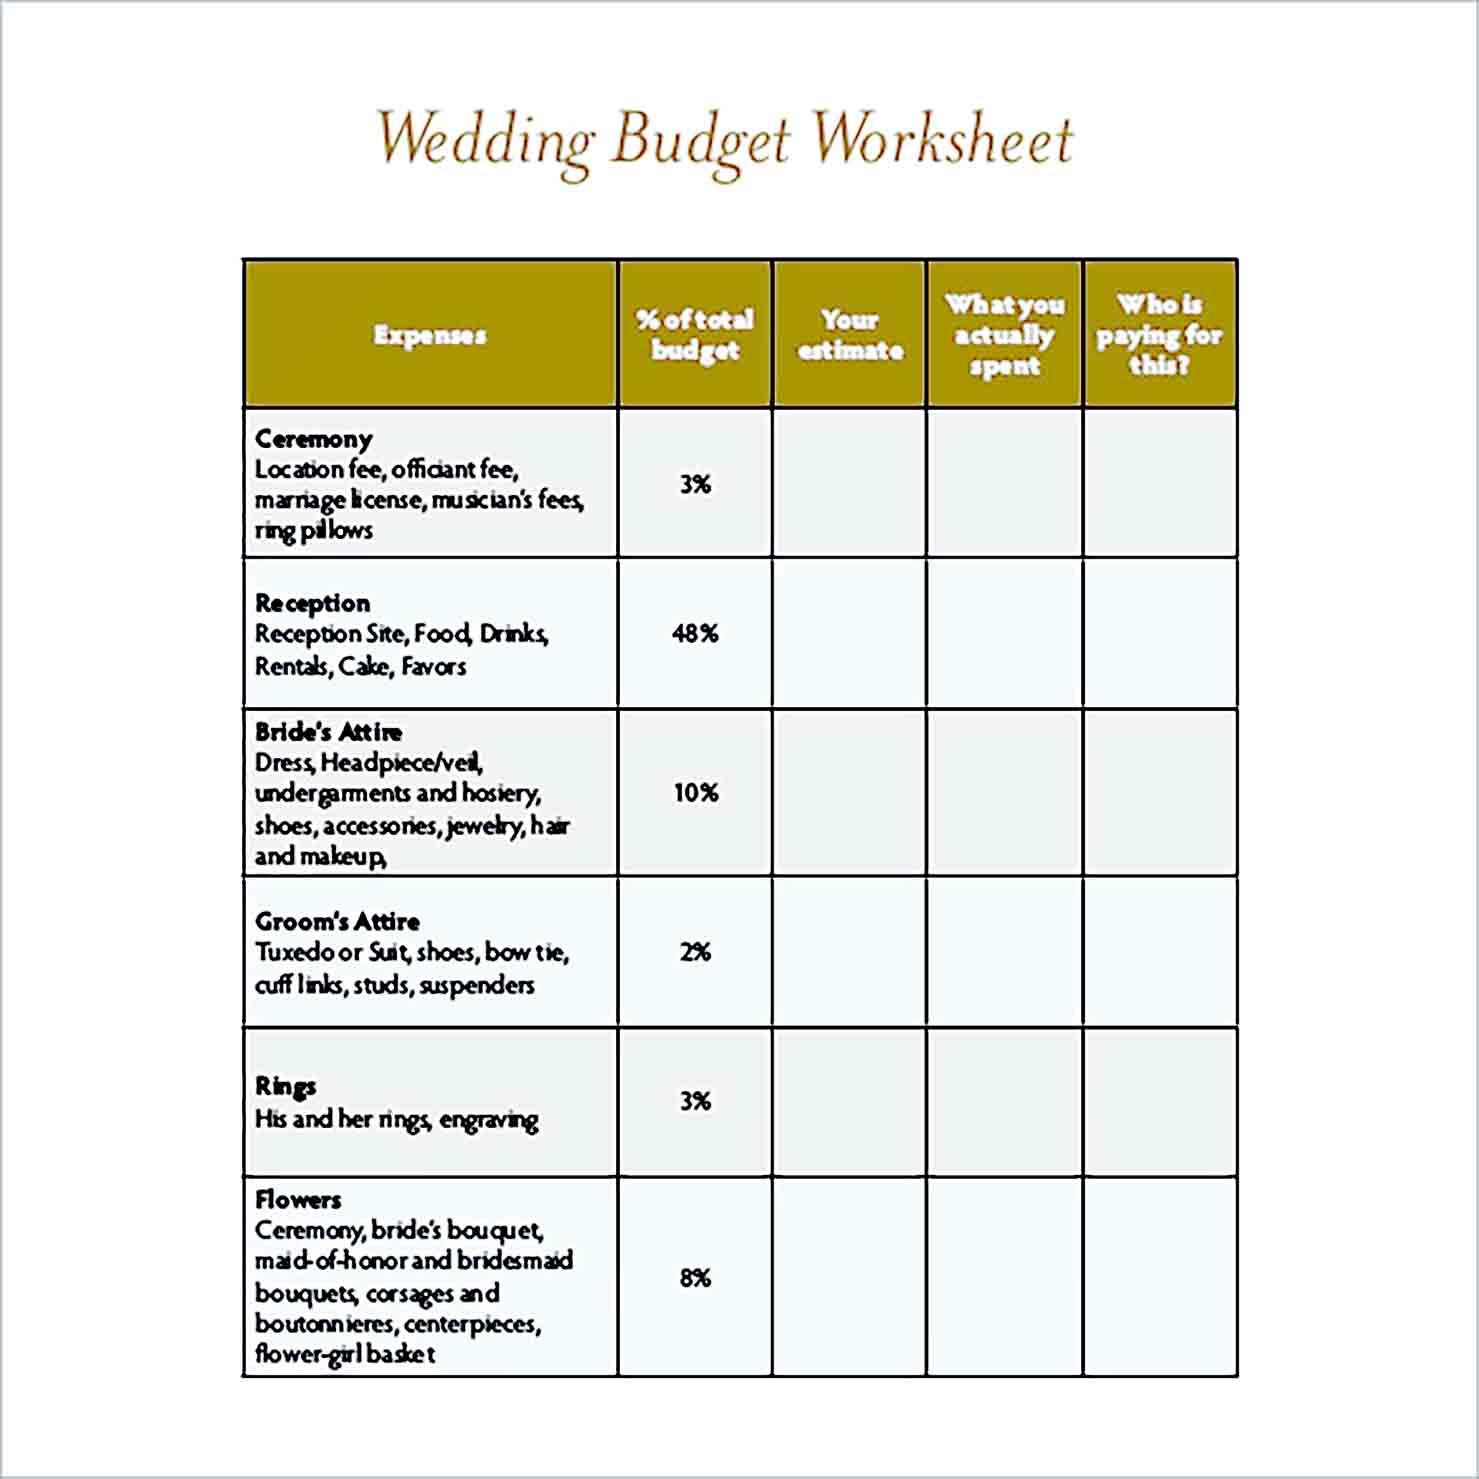 Sample Wedding Budget For